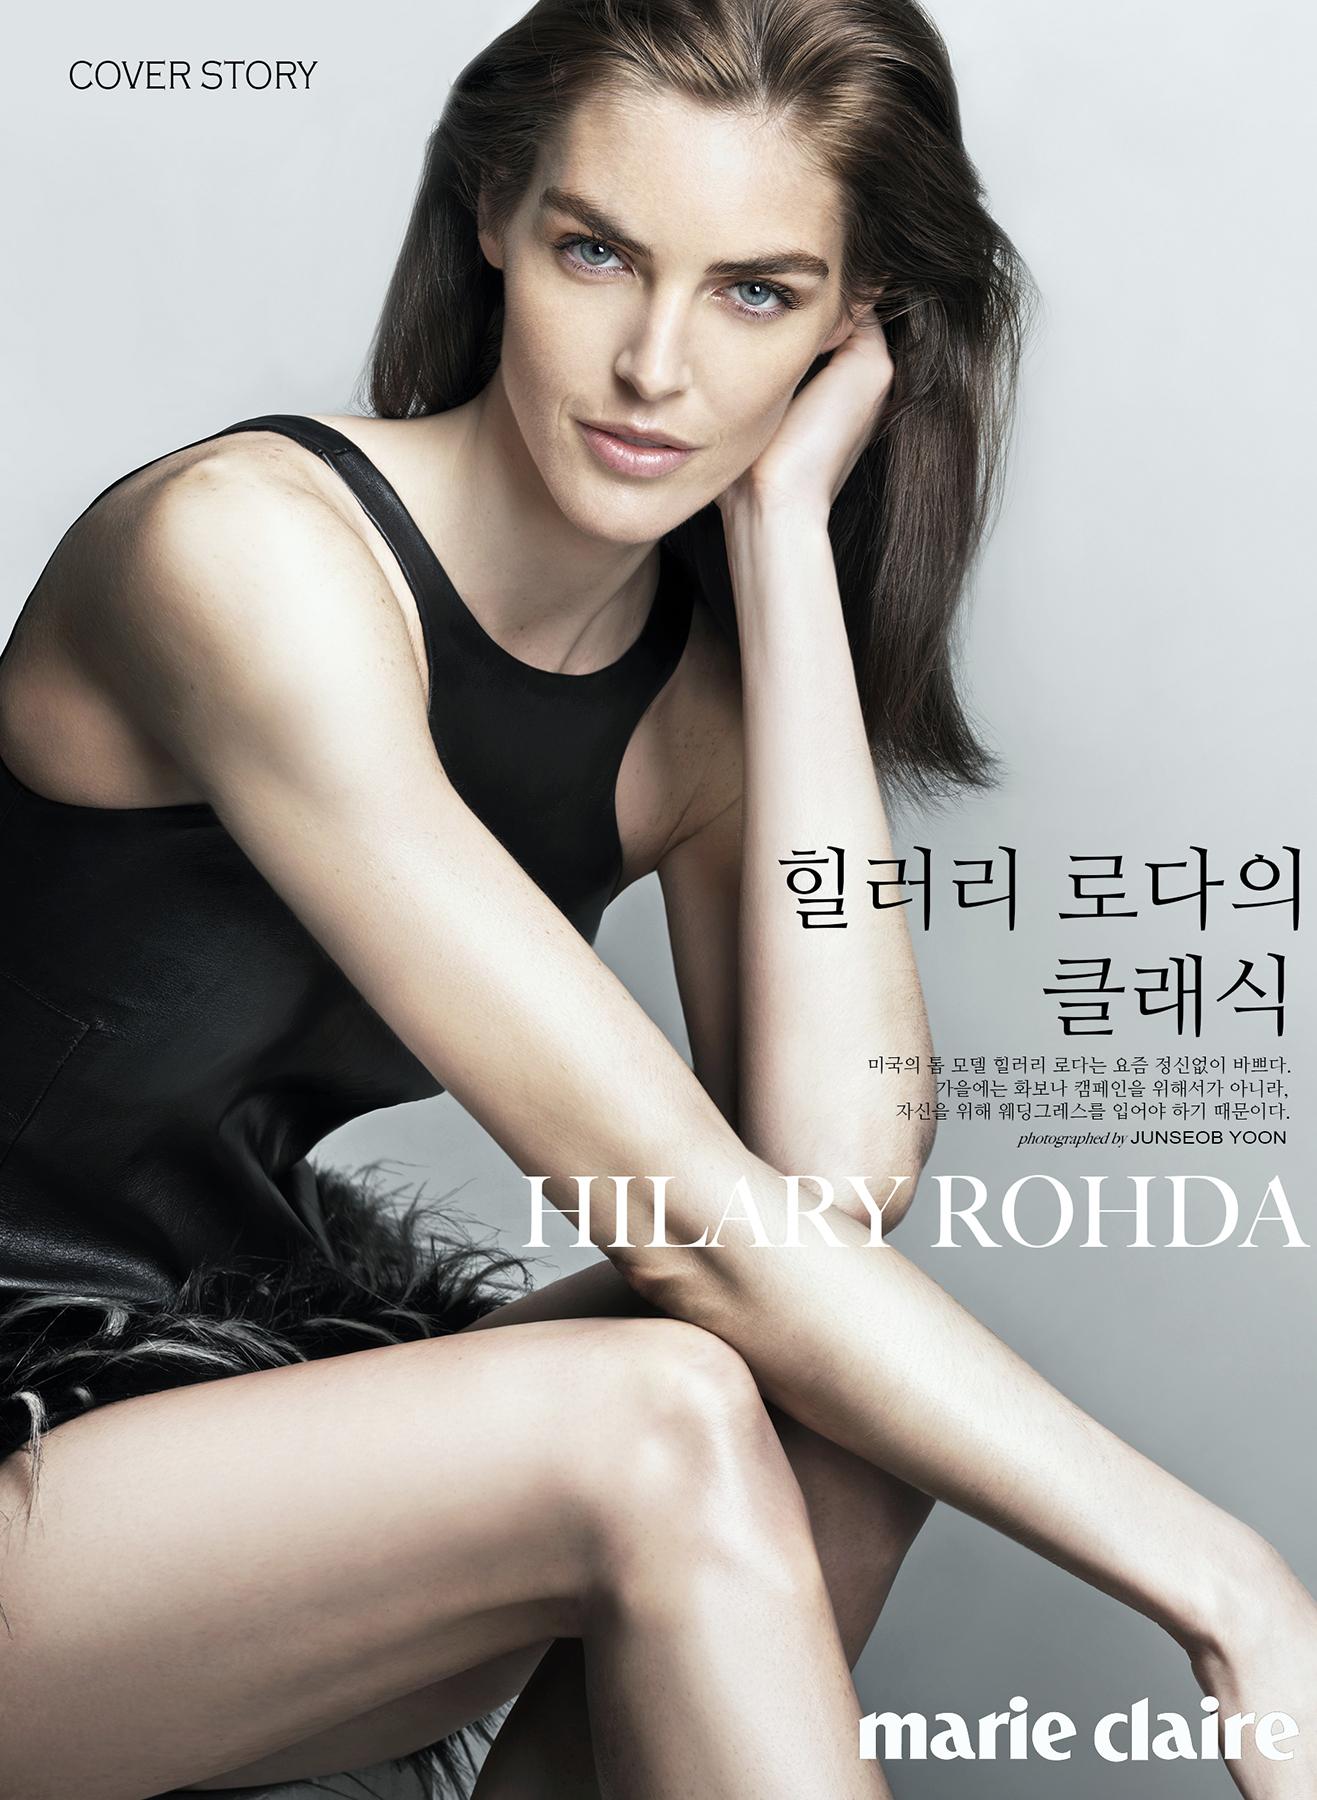 hilary rhoda marie claire korea